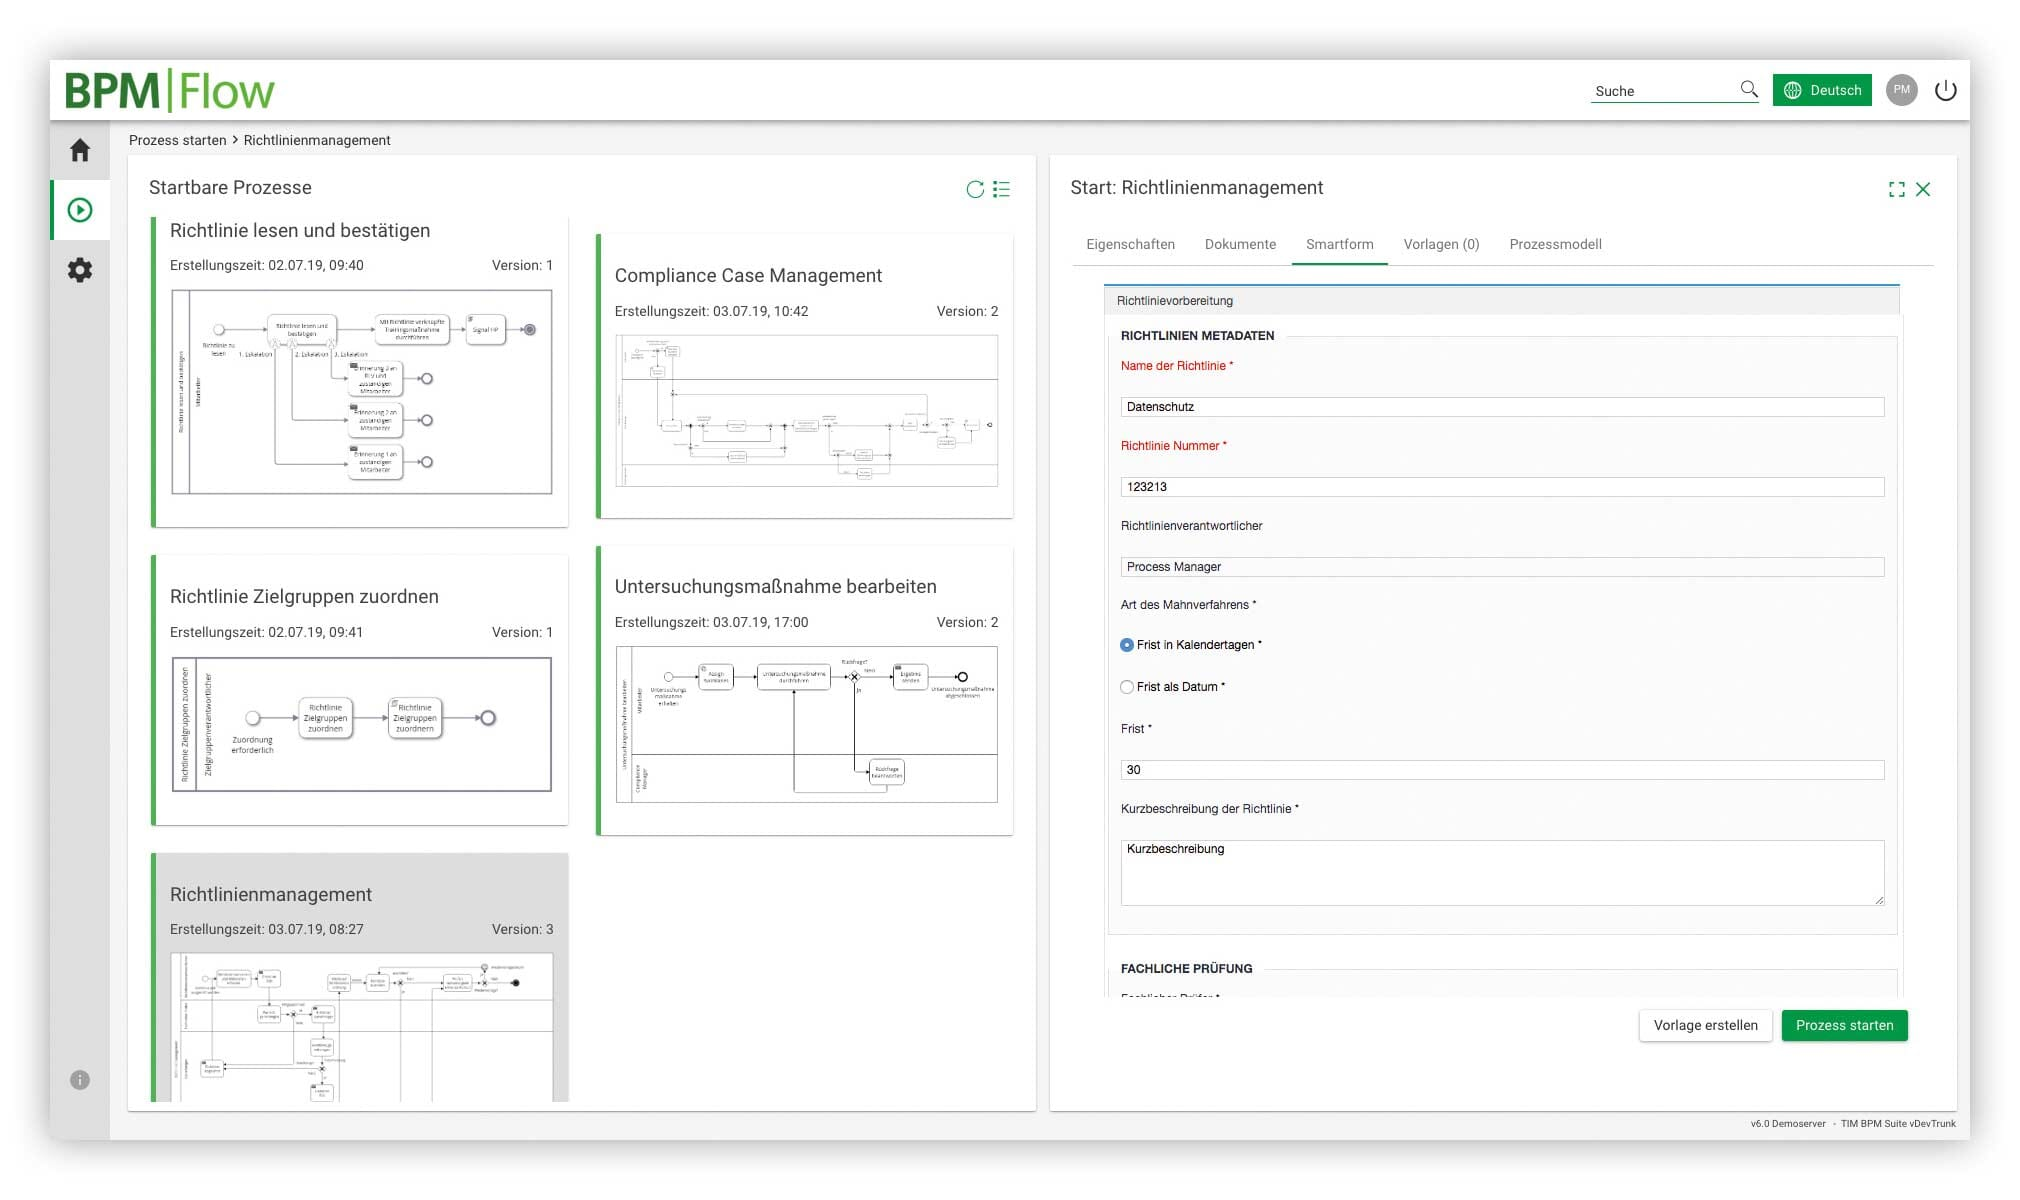 Aeneis-Screenshot: BPM|Flow Startbare Prozessse